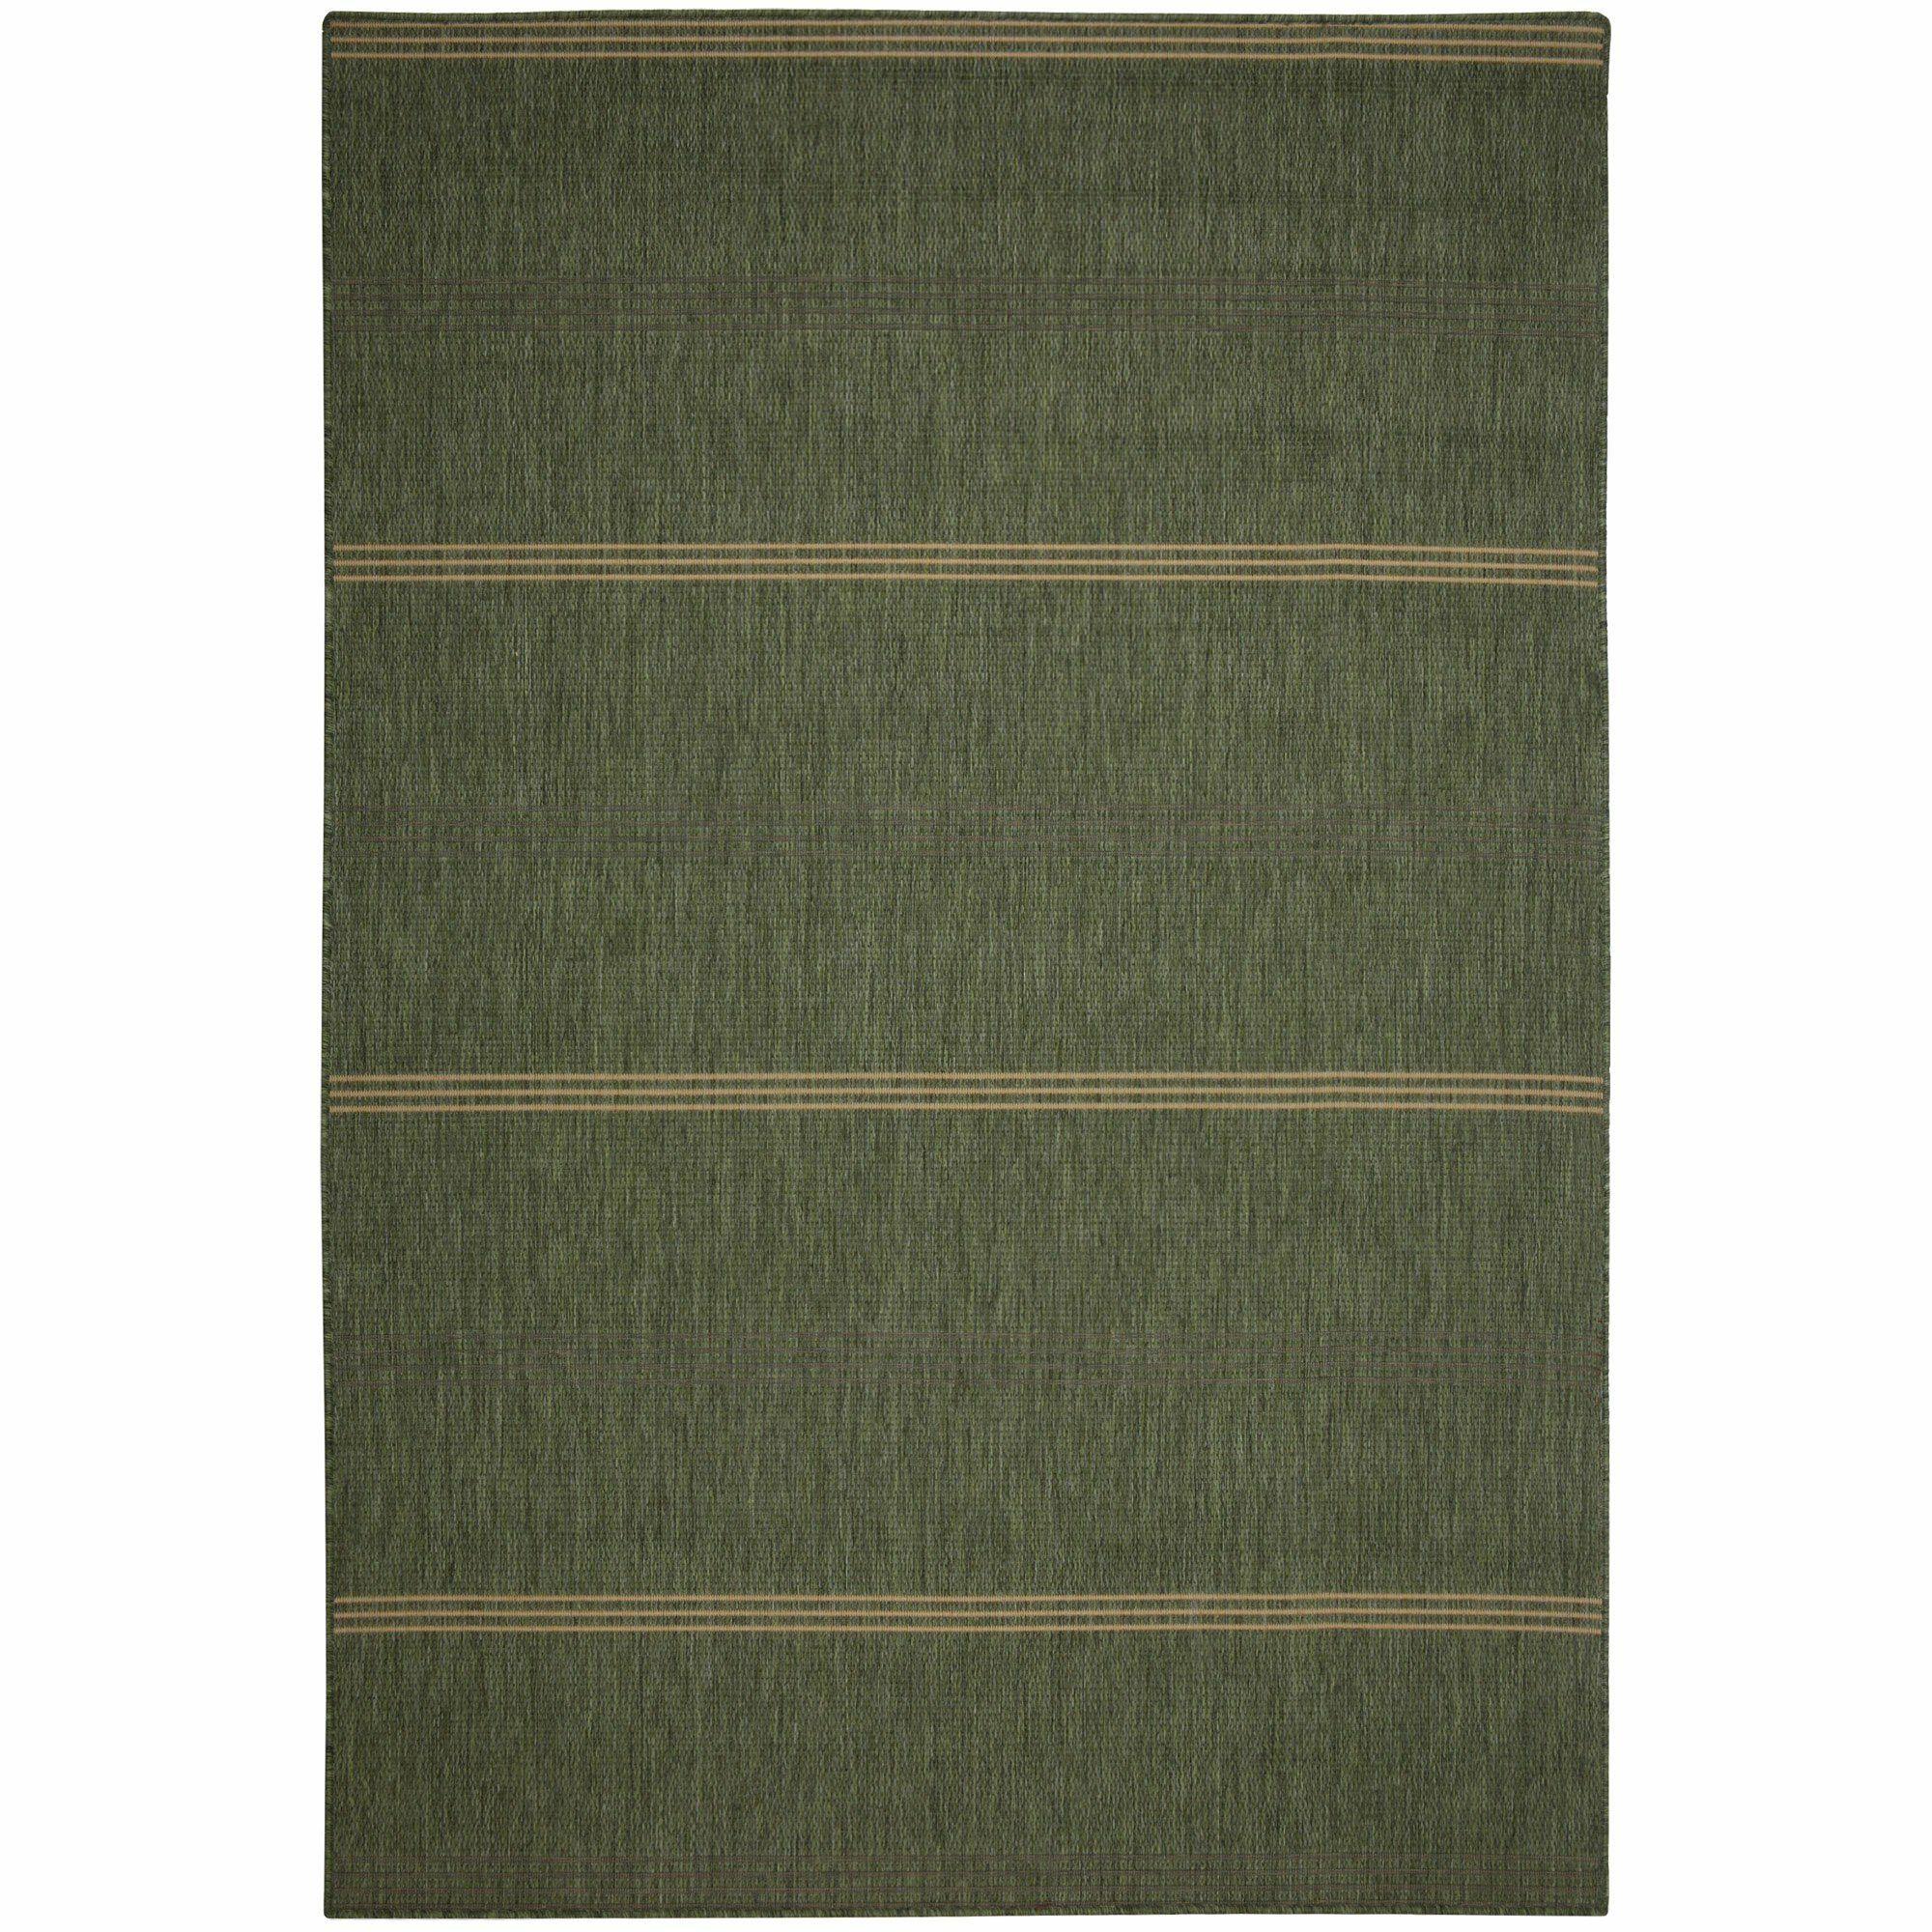 Efird Green Stripe Indoor/Outdoor Area Rug Rug Size: Rectangle 2' x 3'